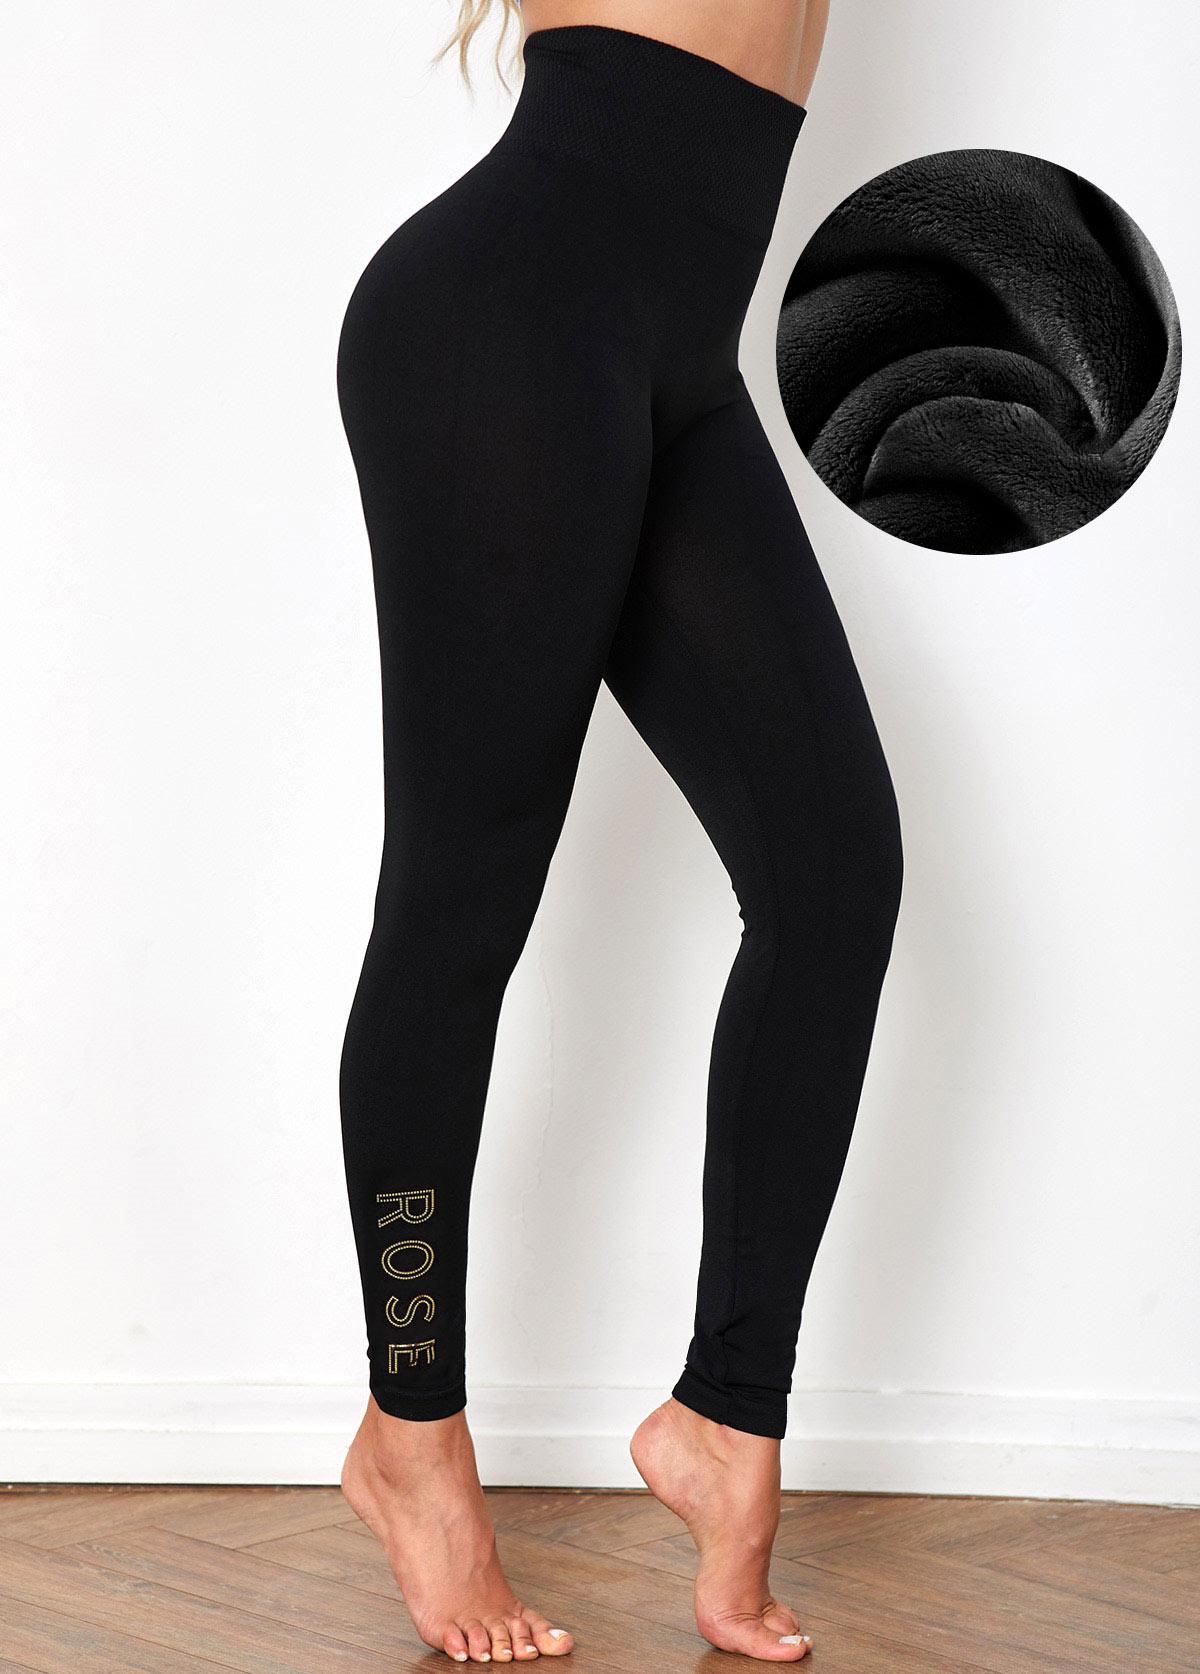 Super Elastic High Waist Sequin Letter Legging Pants